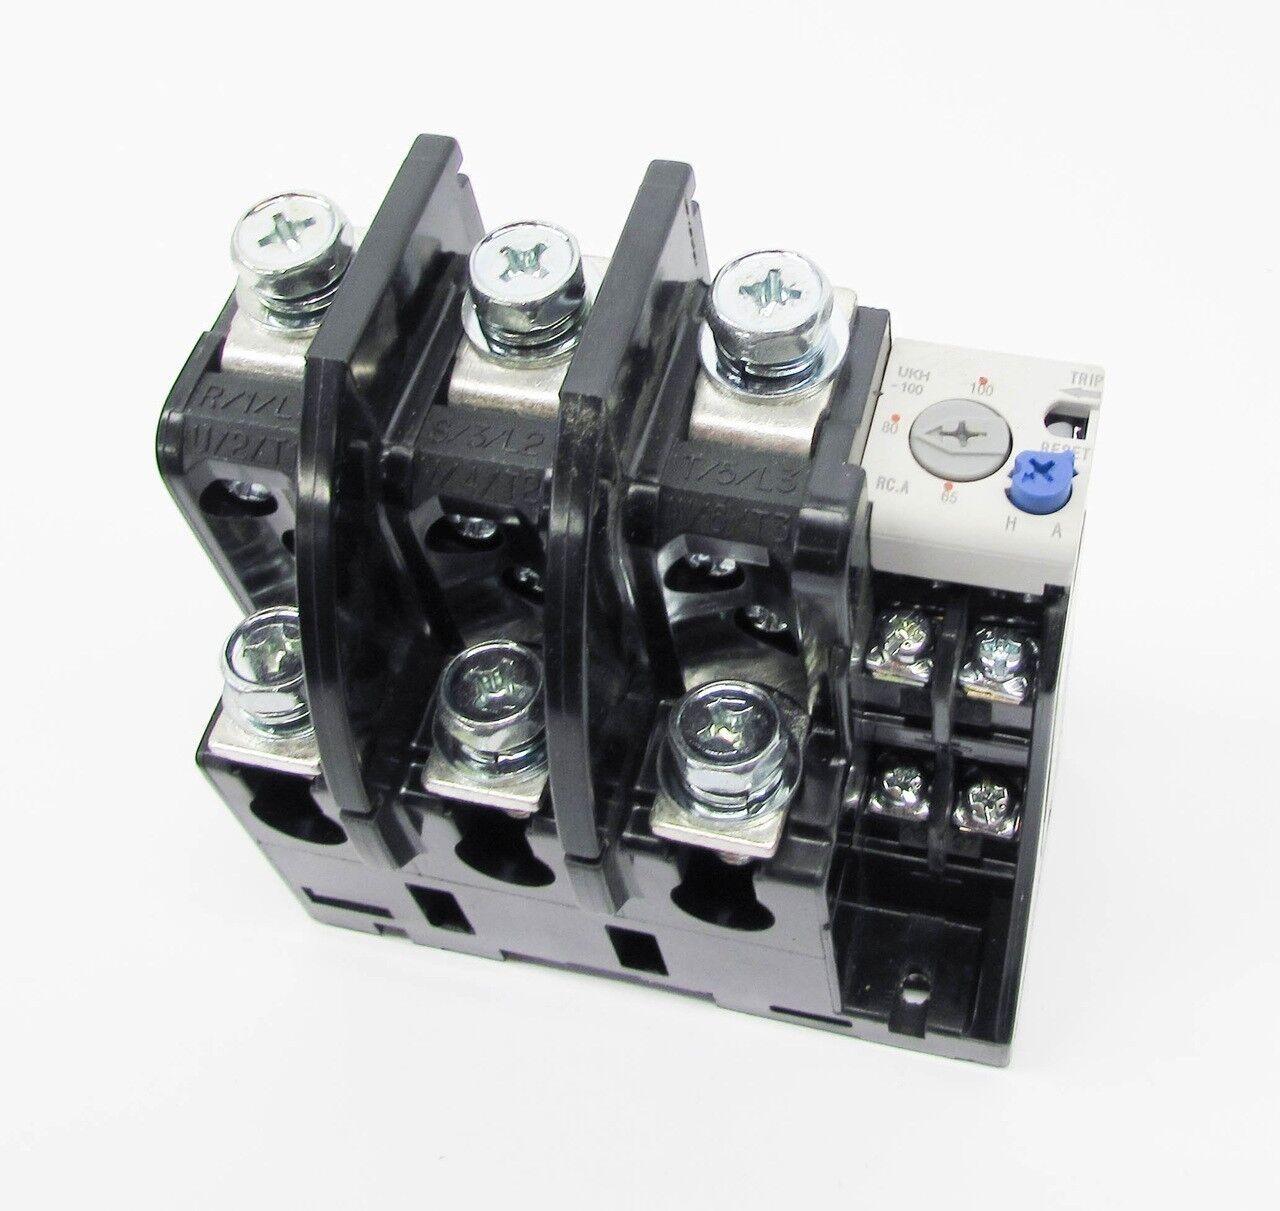 KRIPAL UKH-150 100-150 N 100 - 150A NEW